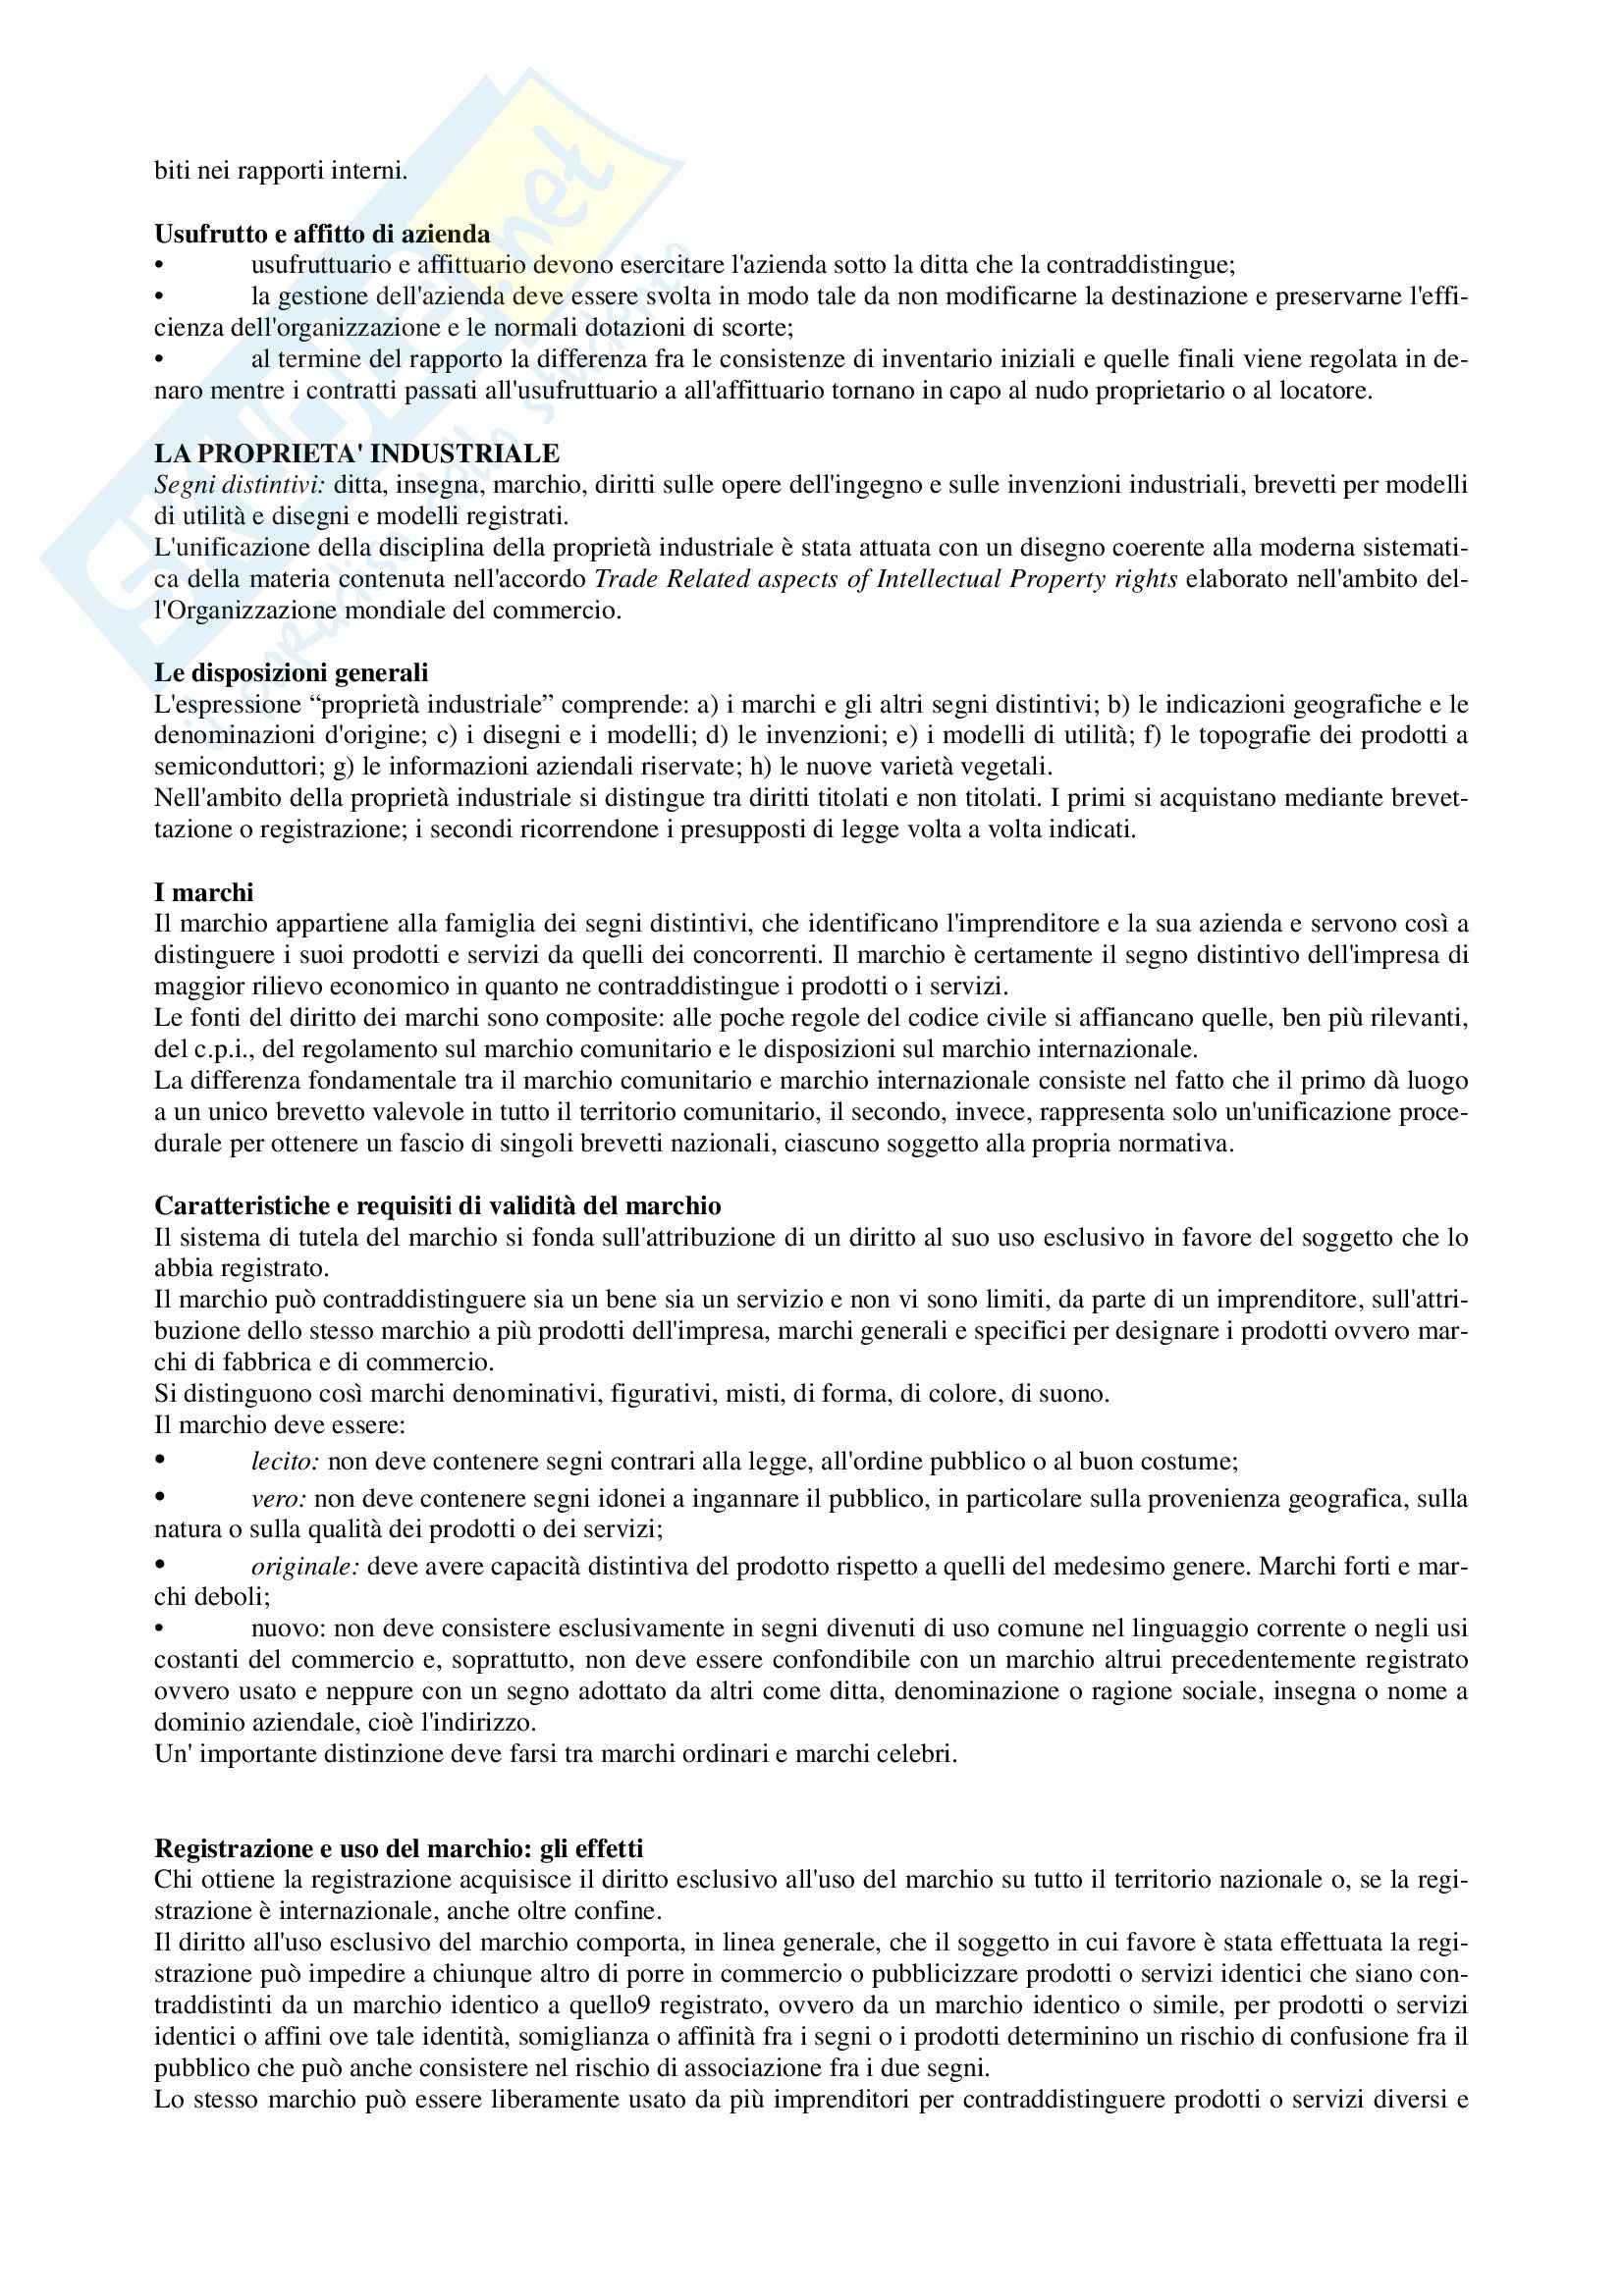 Diritto commerciale - Appunti Pag. 6